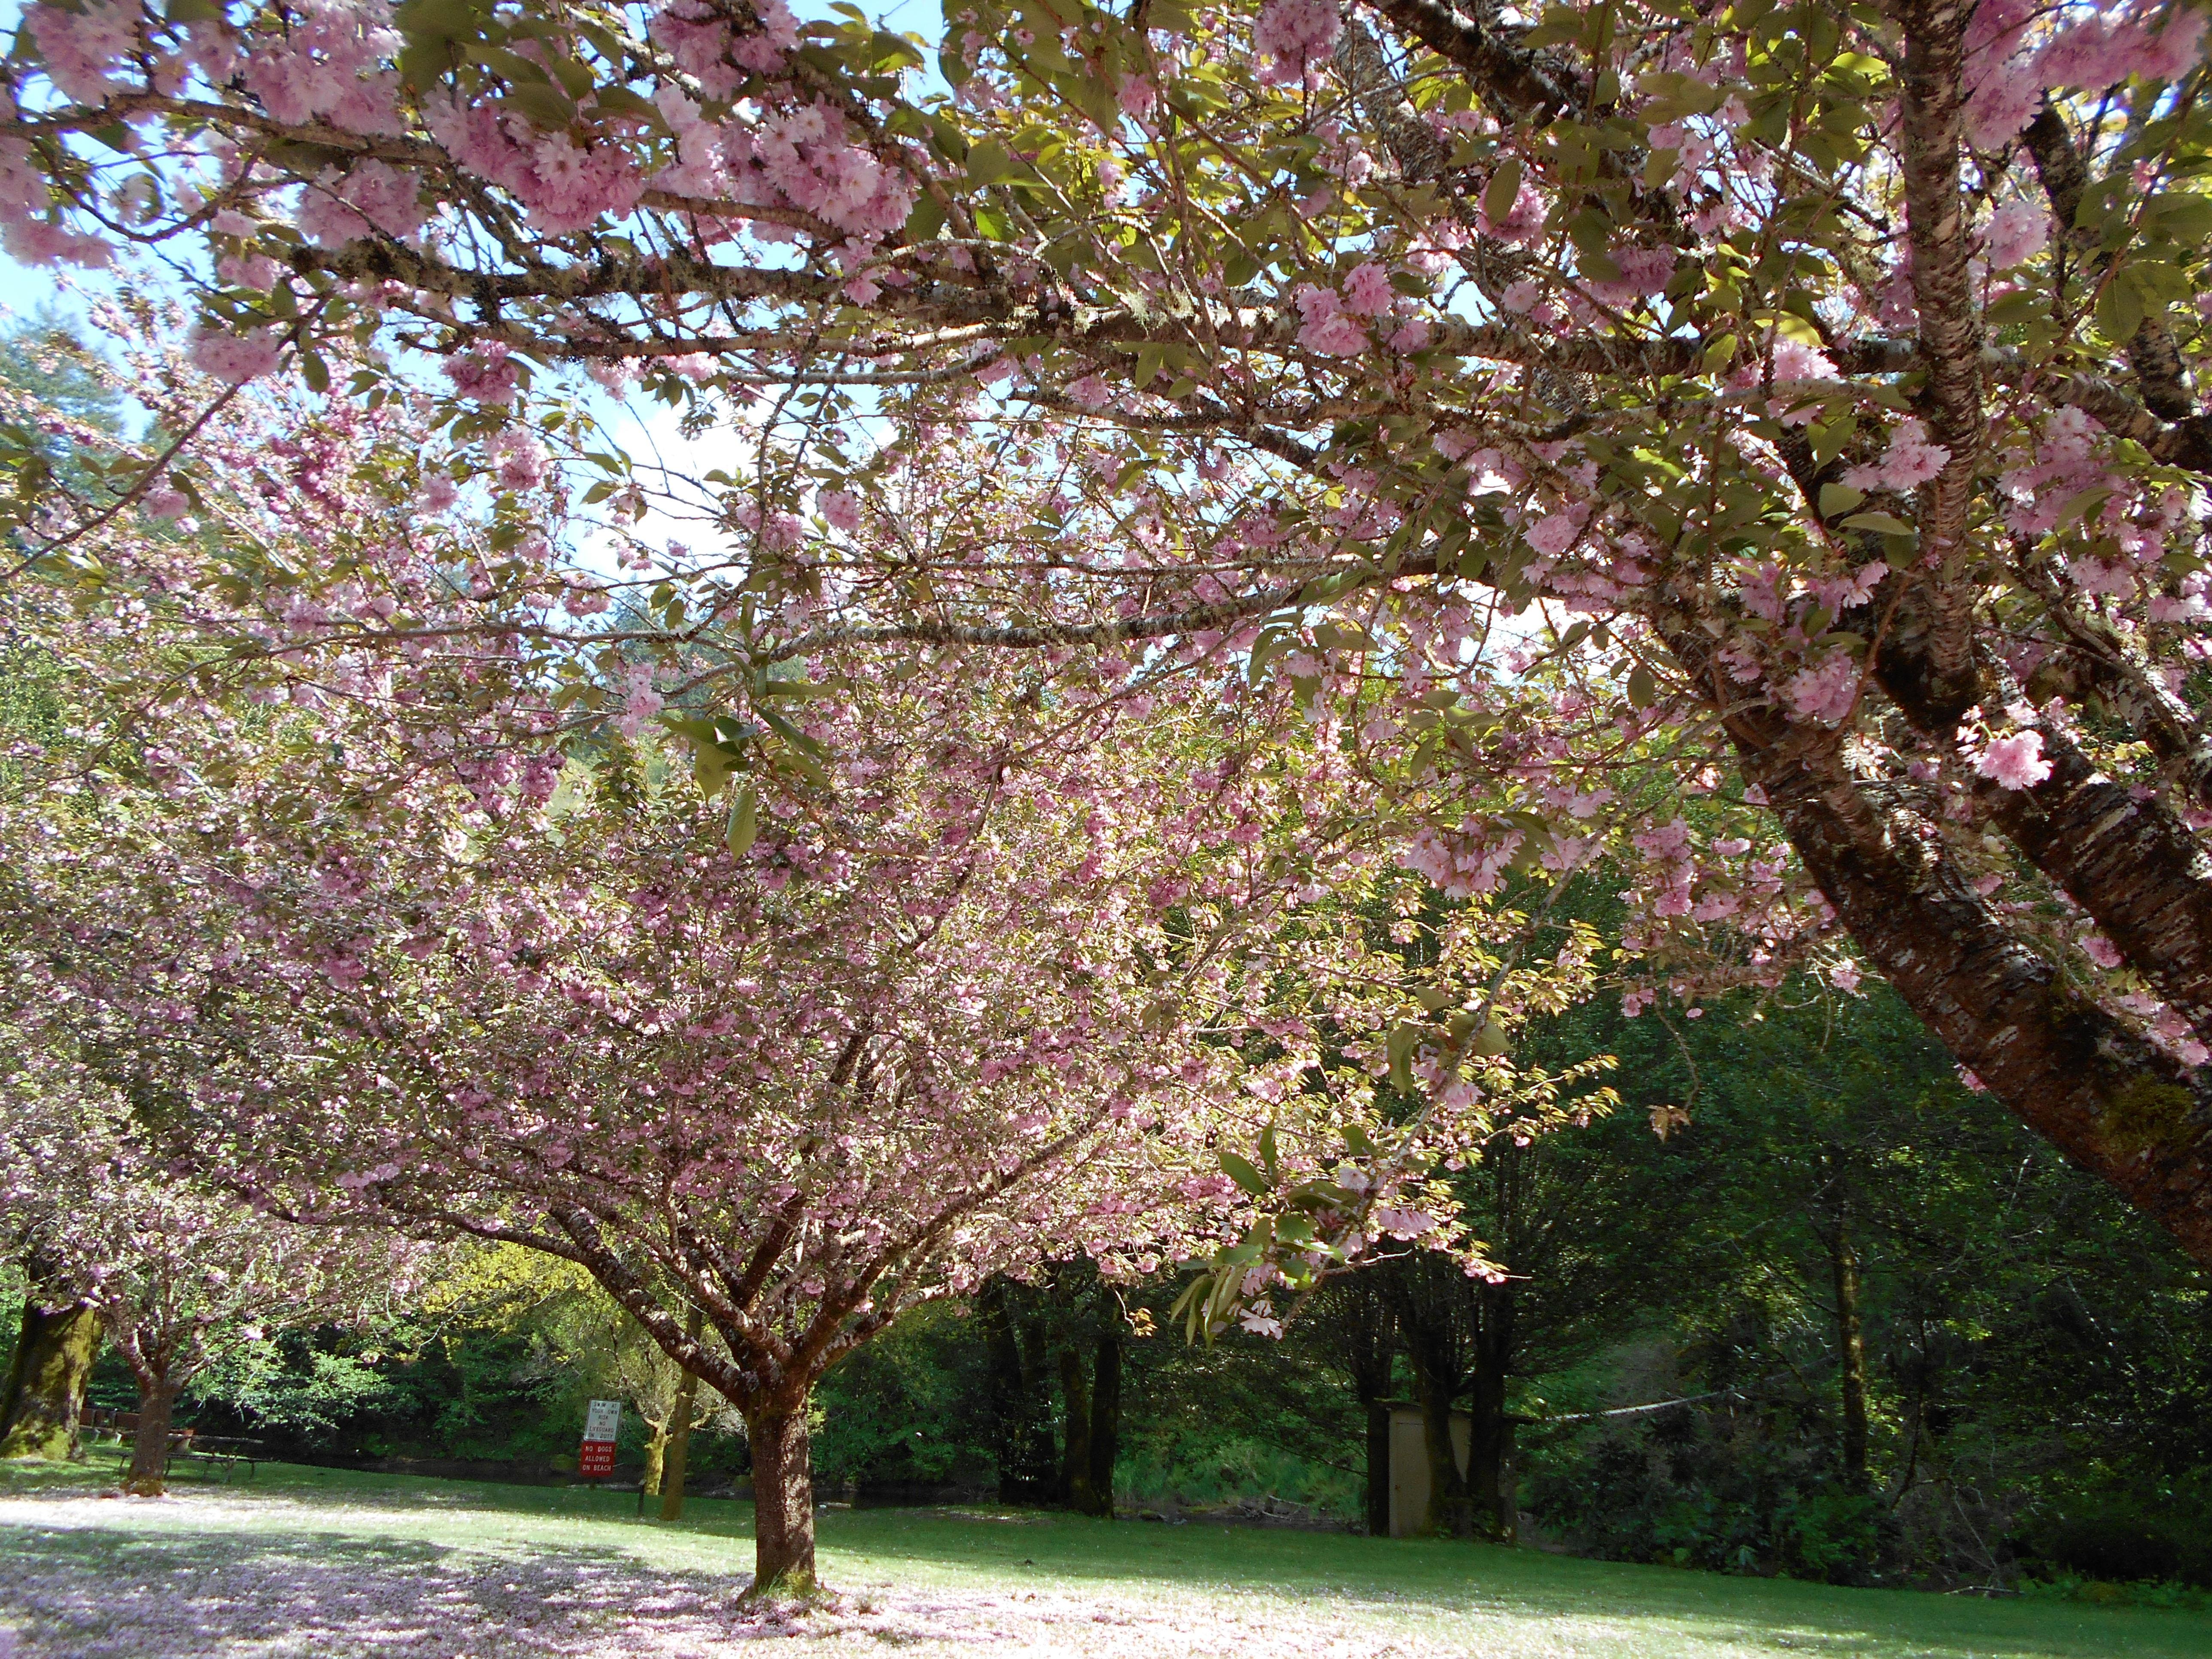 Lavern Park